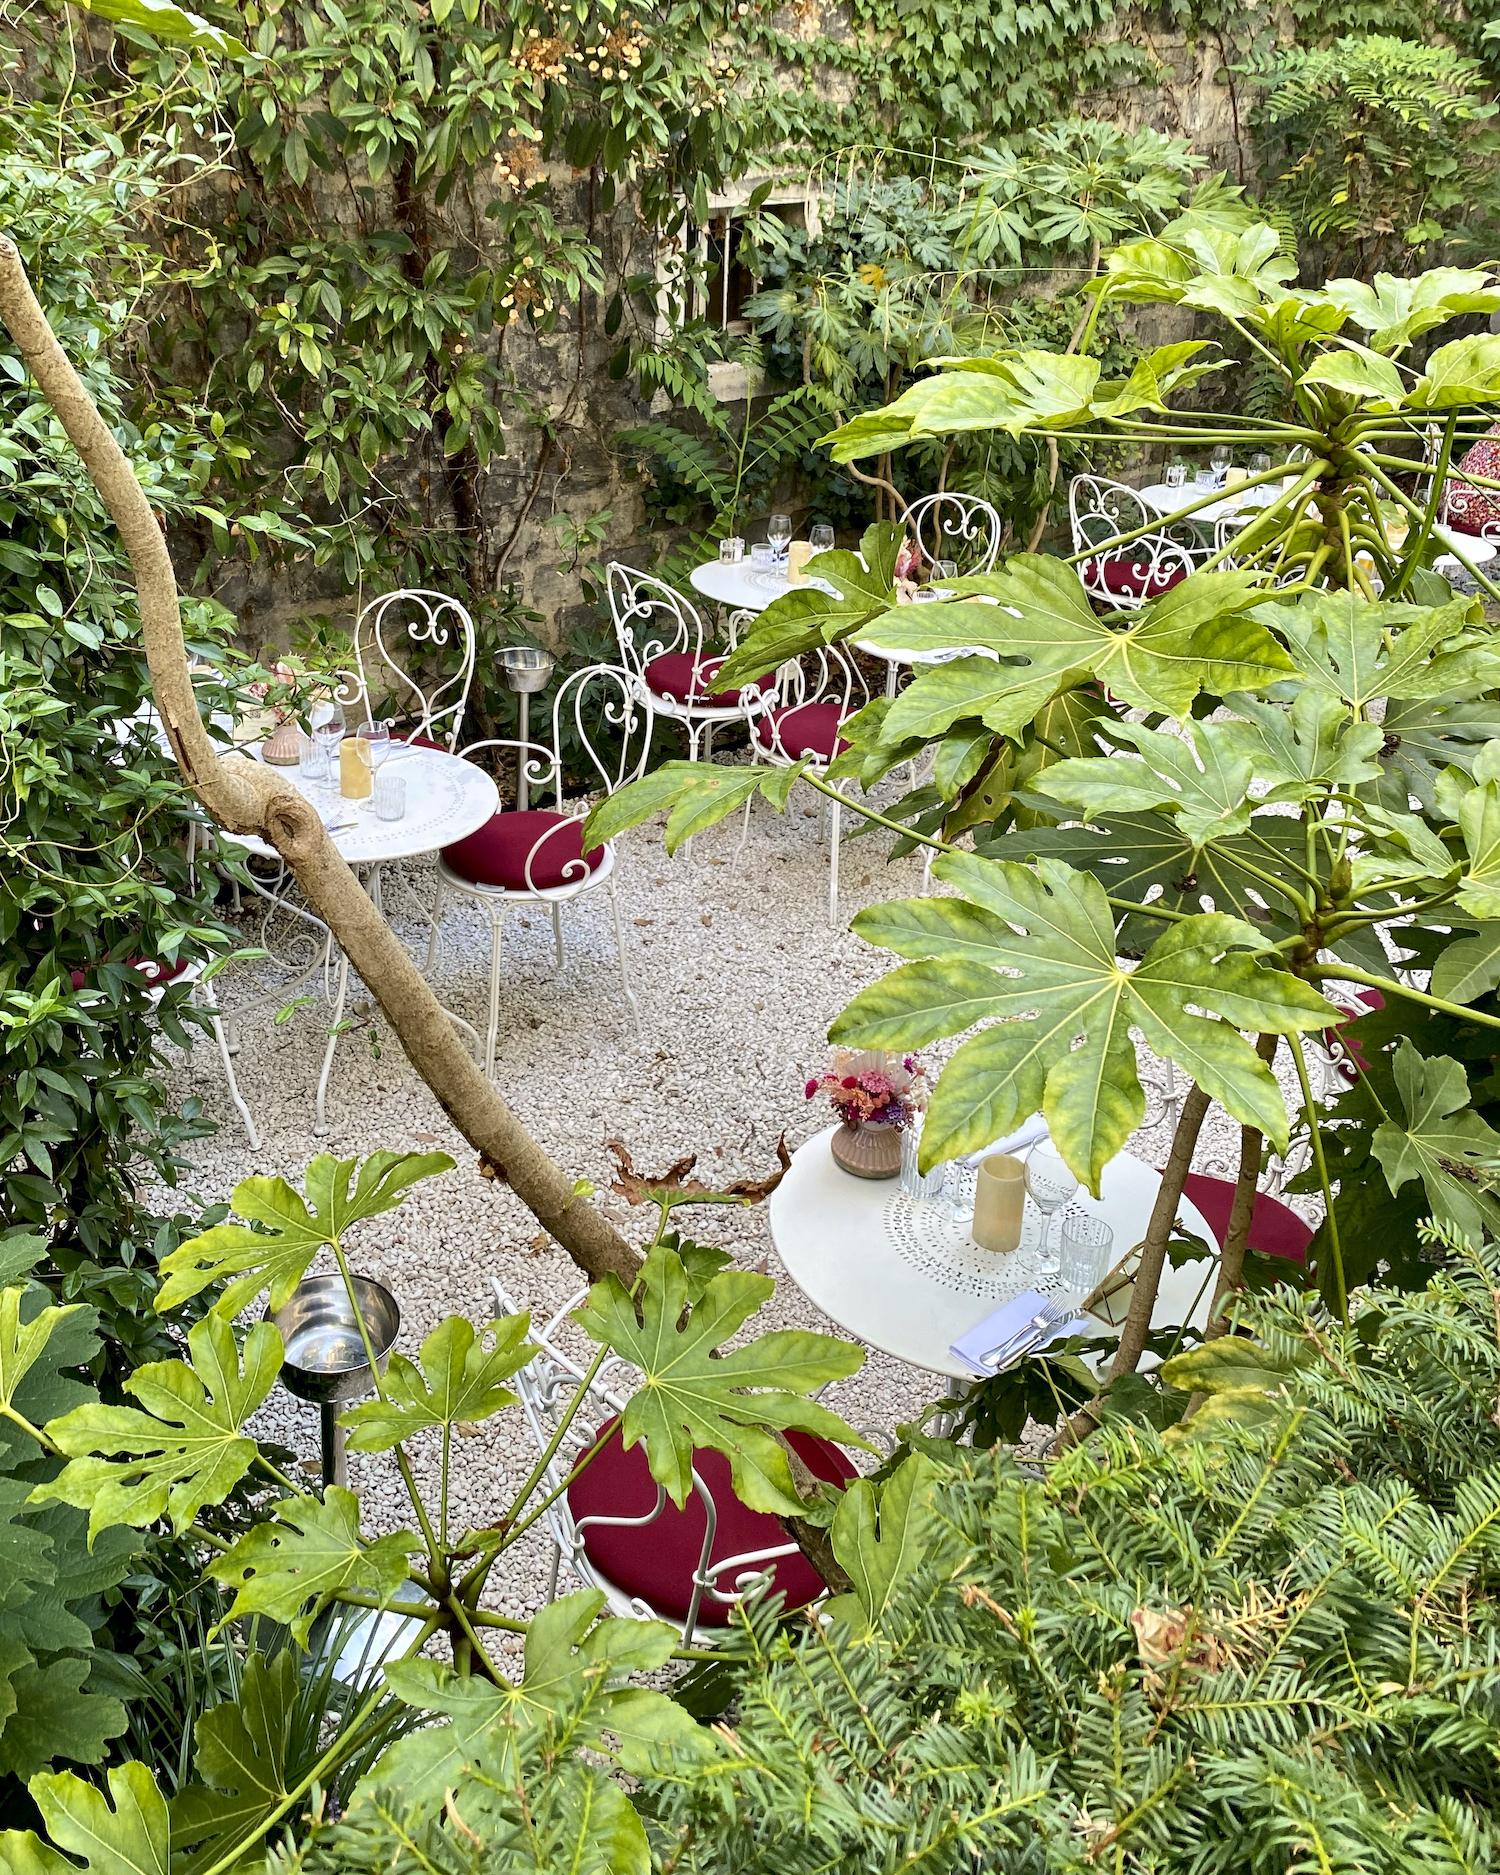 Weekend Links Week 11 the garden at Hotel Particulier in Paris